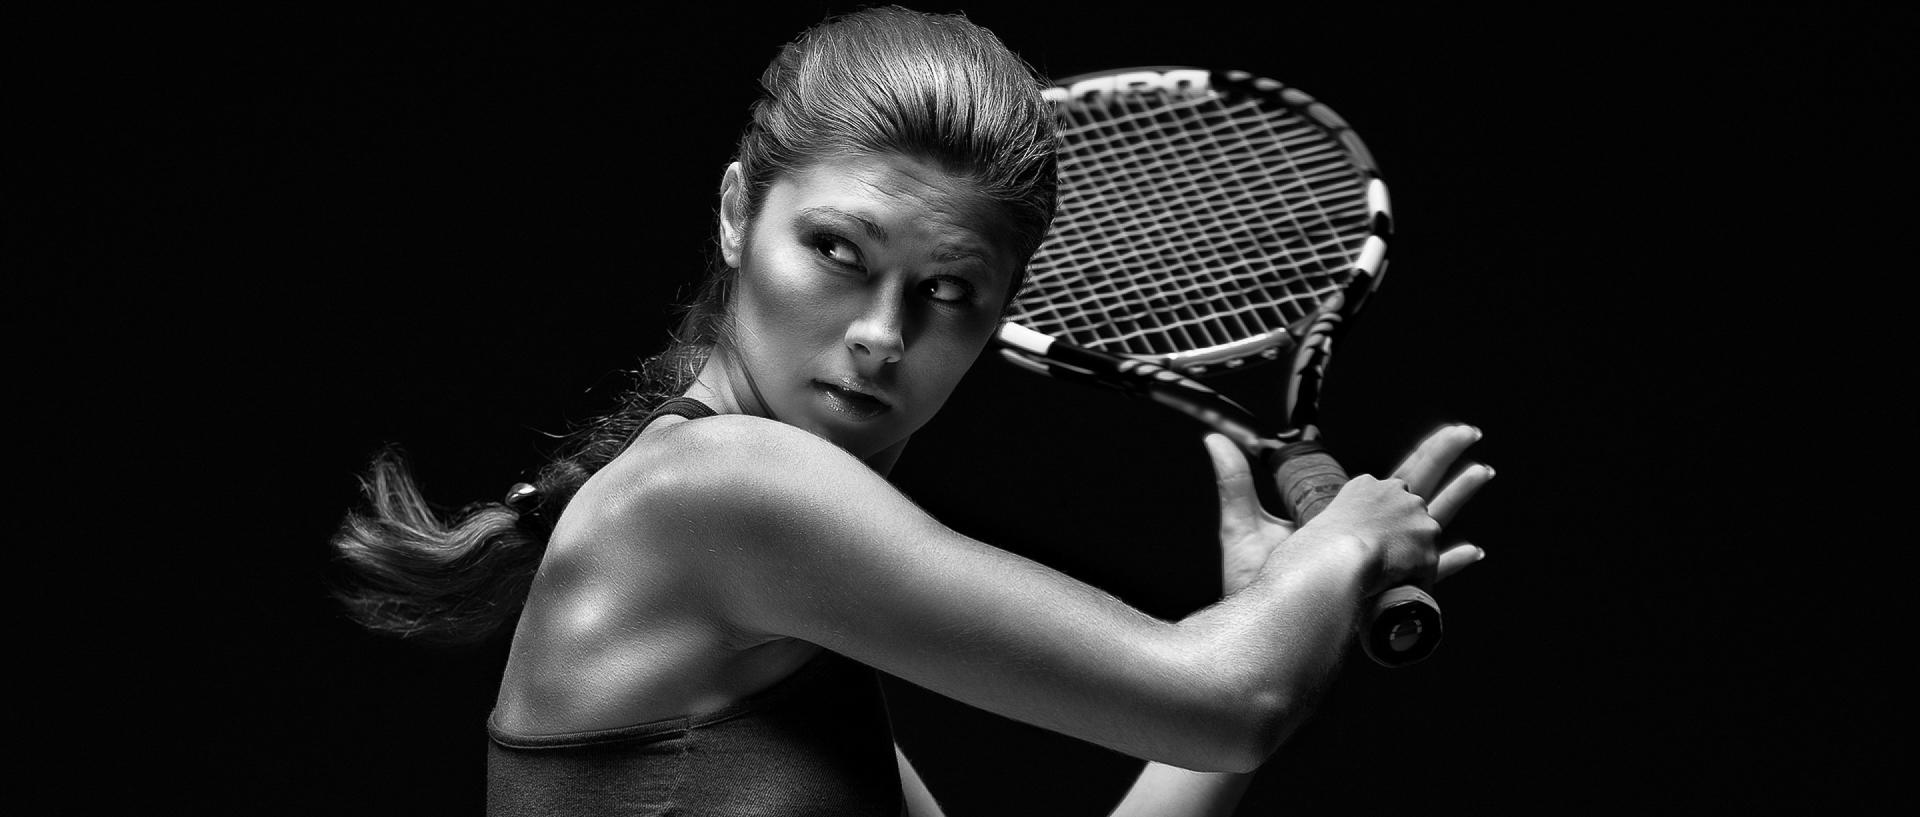 Chica-jugador-de-tenis-raqueta-1800x2880